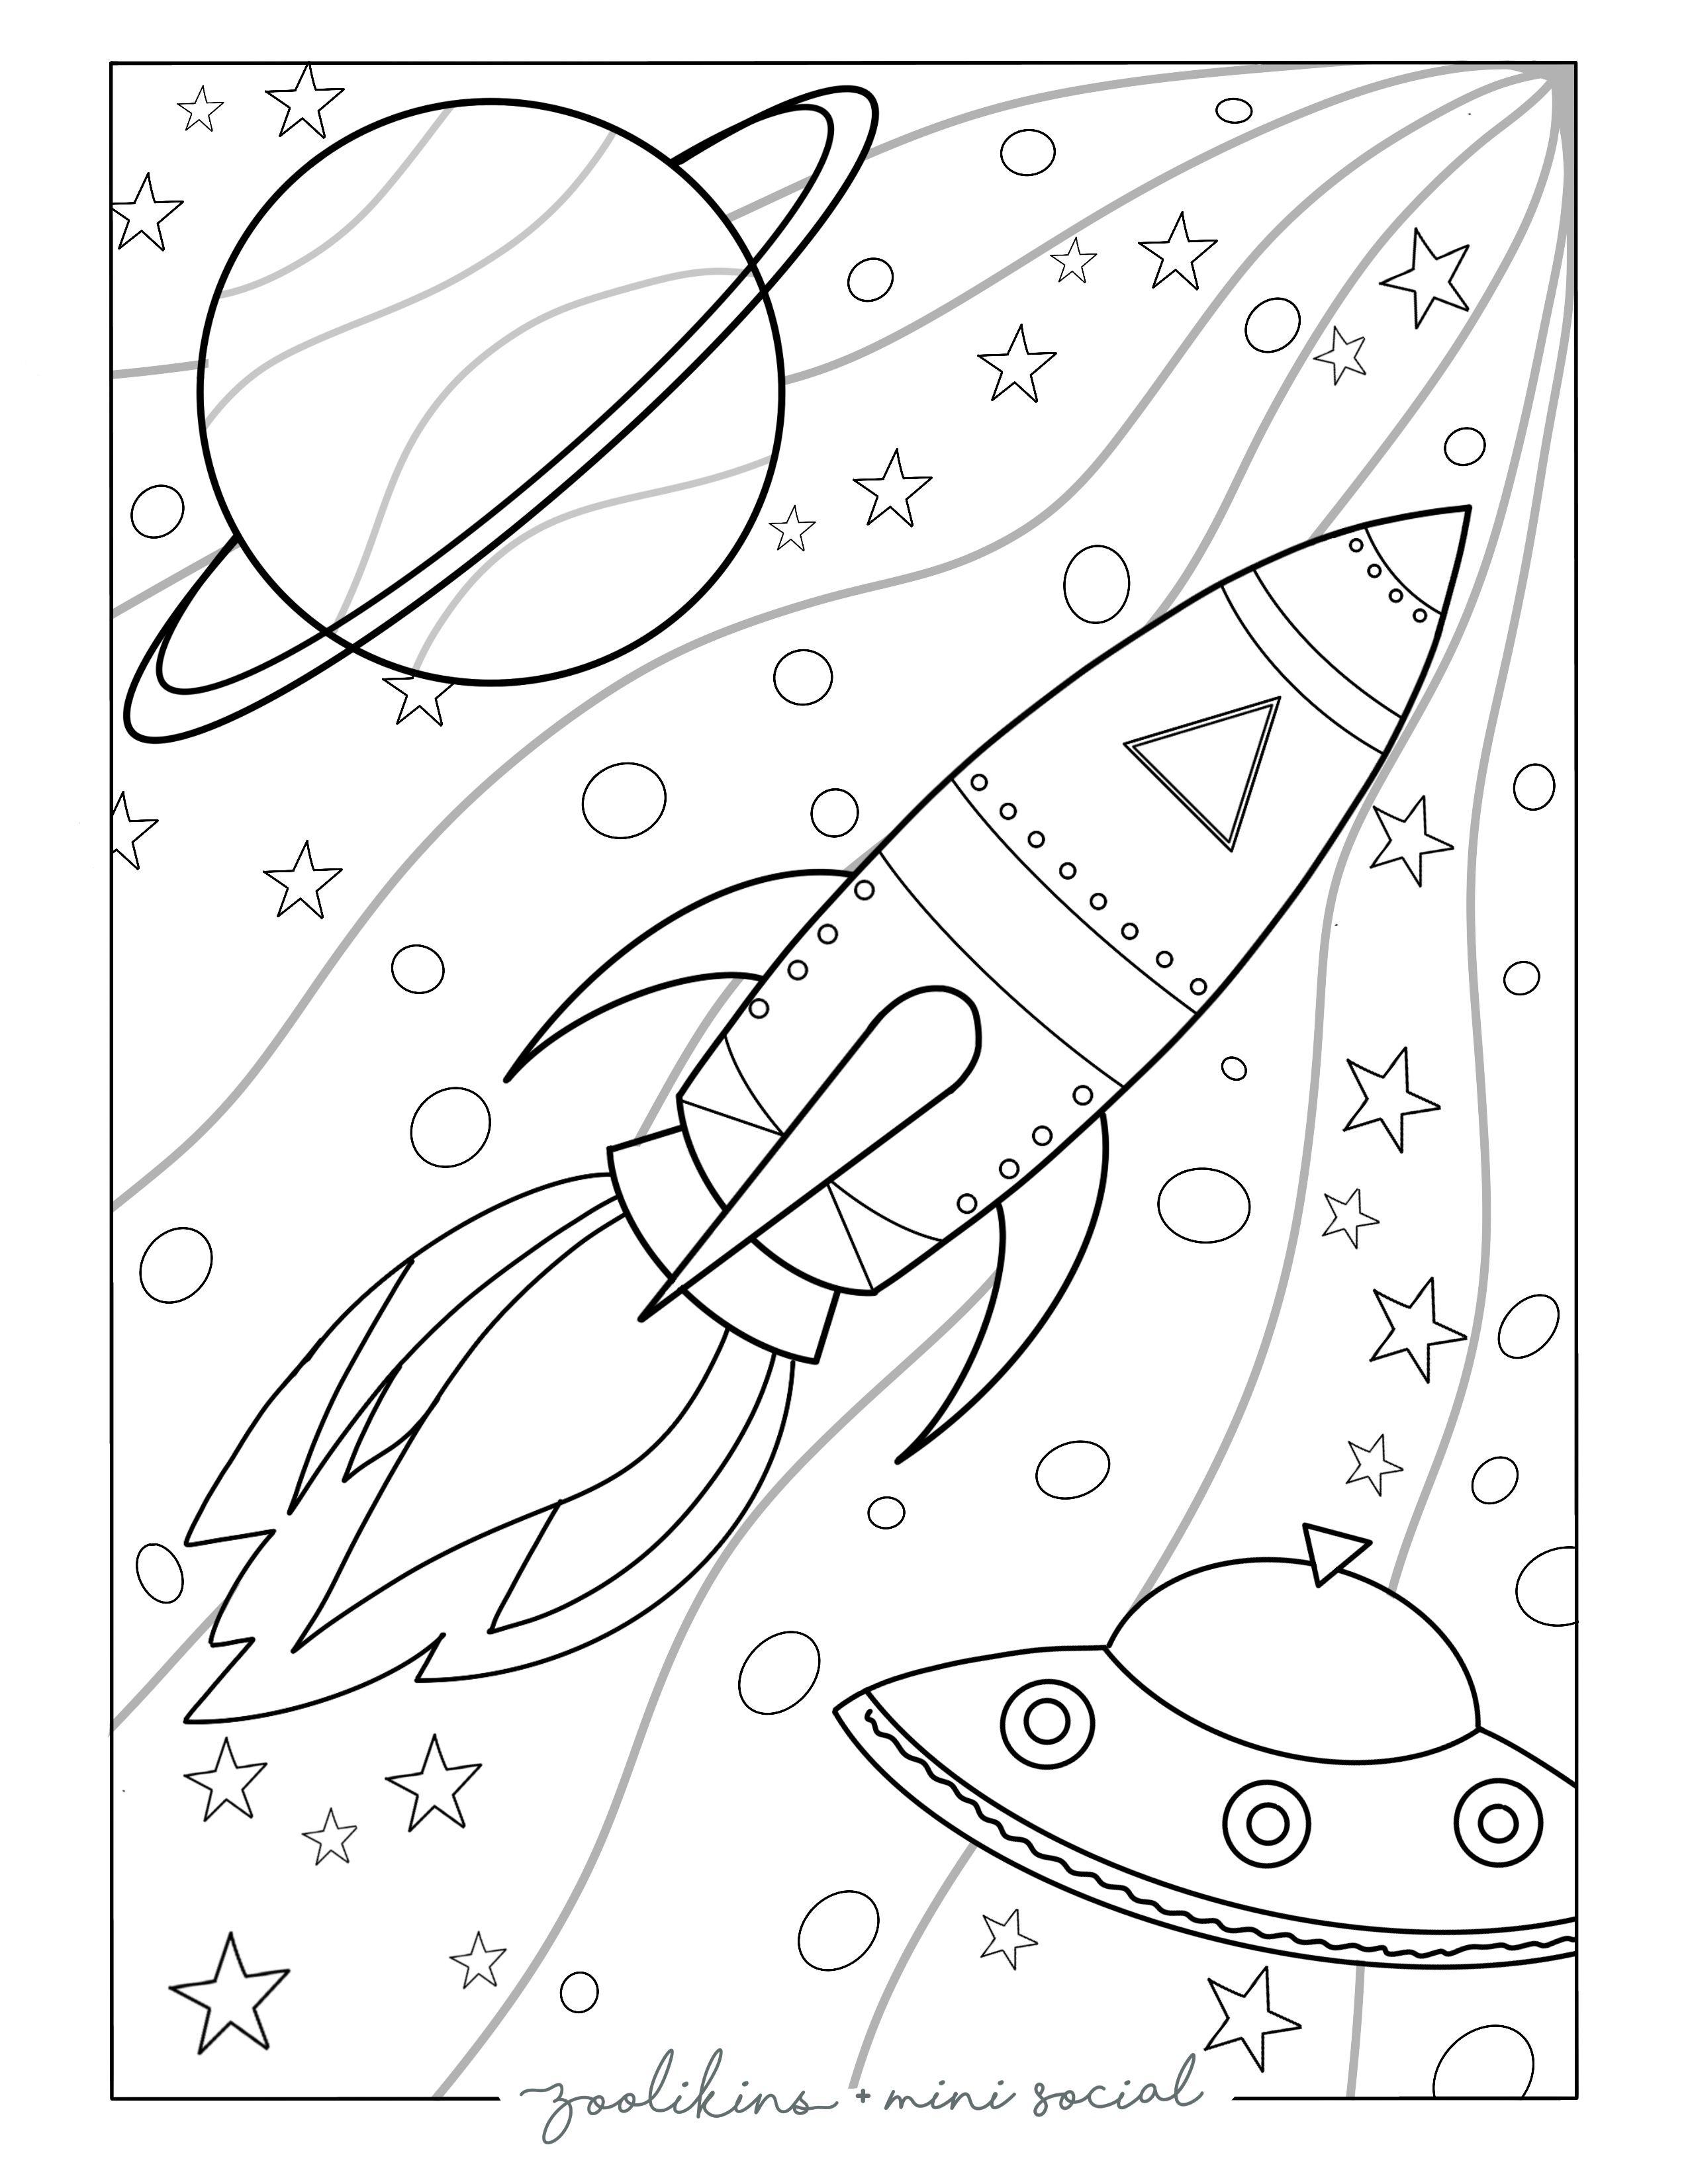 Space Coloring Page Space Coloring Pages Coloring Pages Christmas Coloring Pages [ 3300 x 2550 Pixel ]